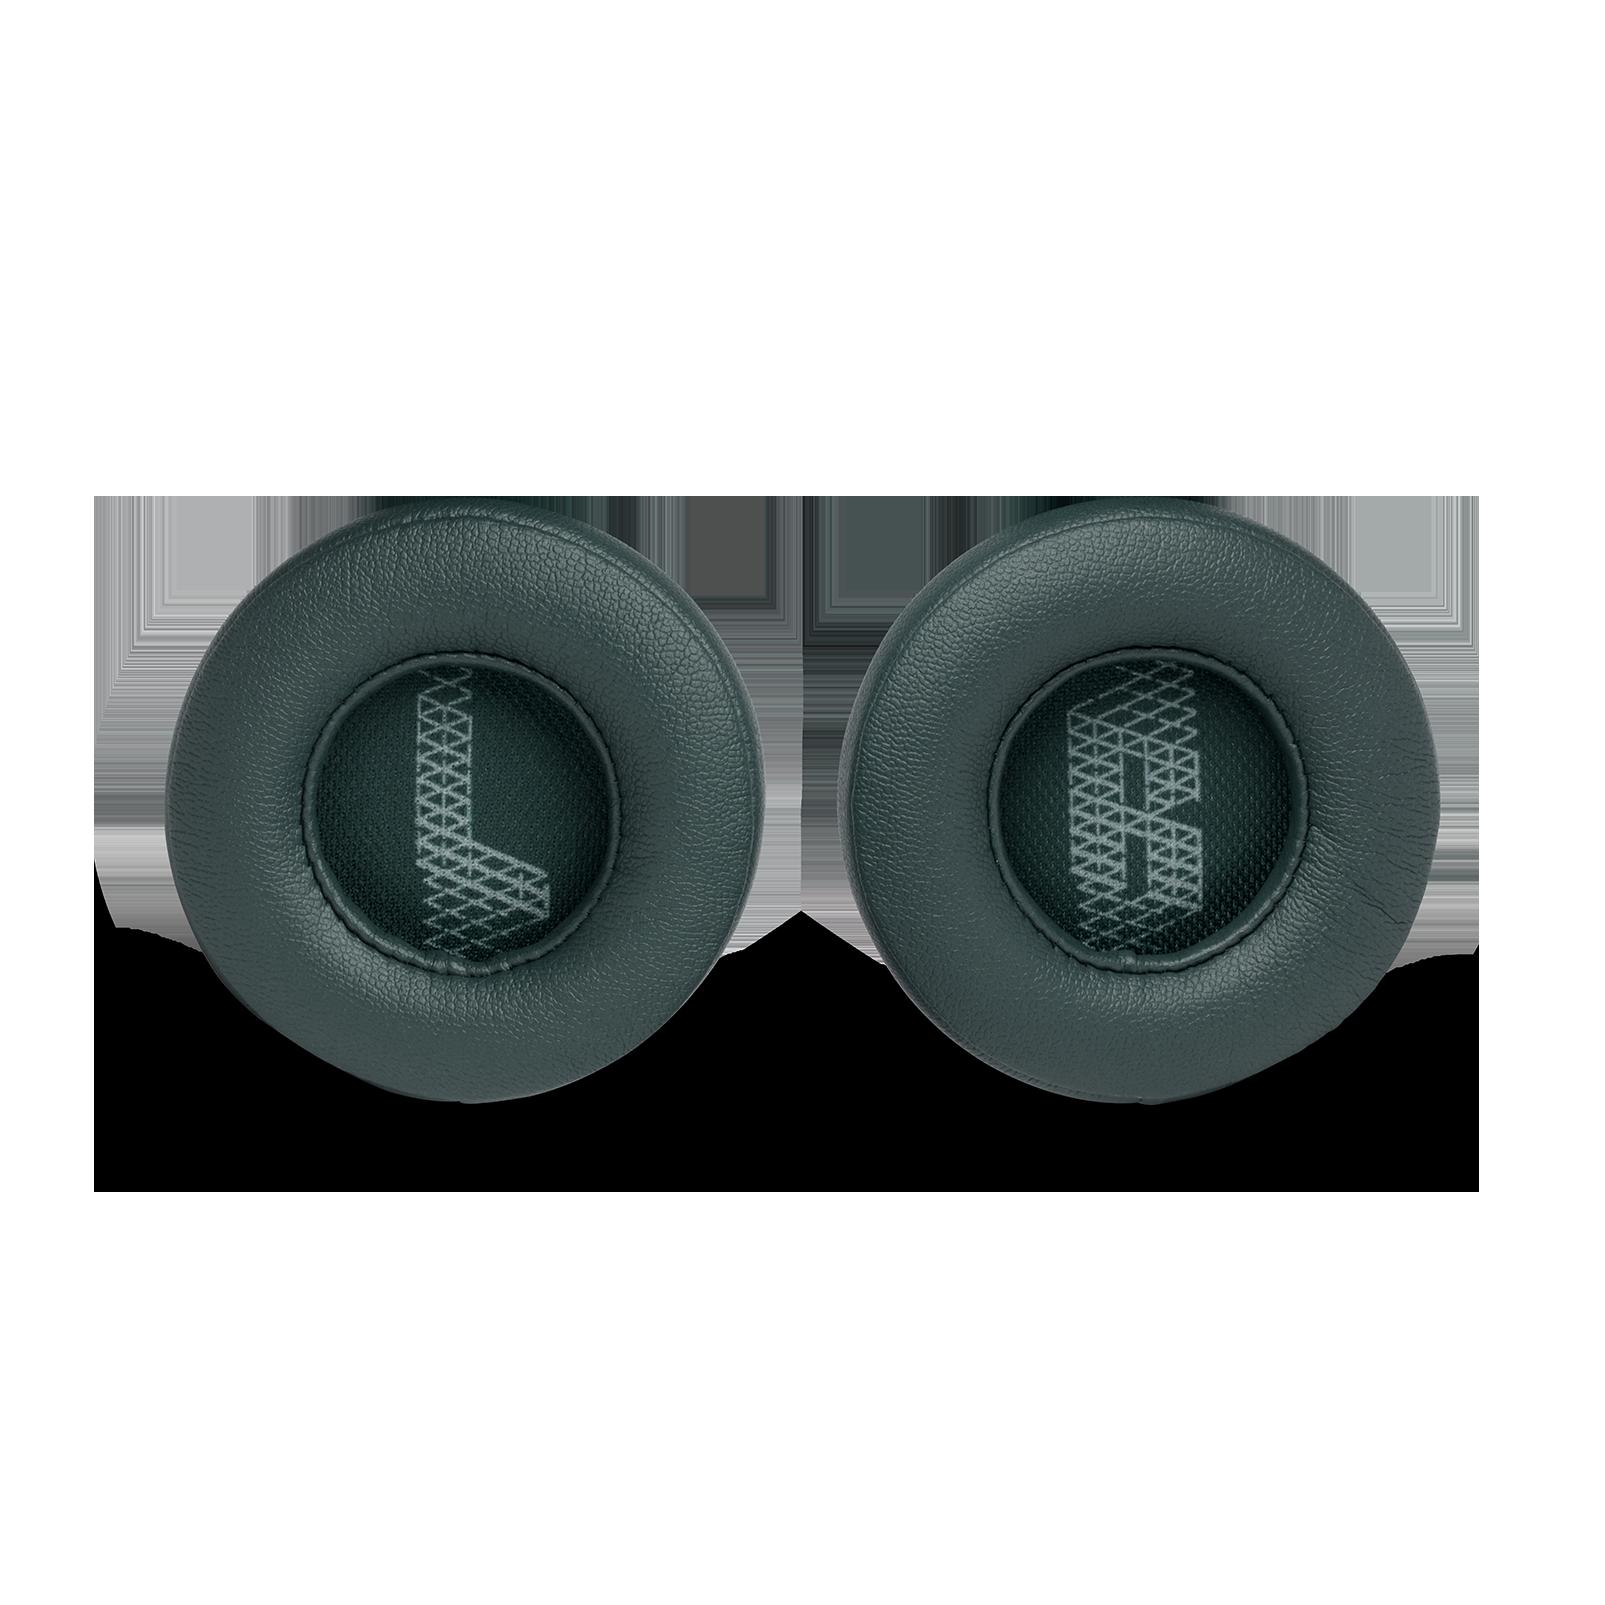 JBL Ear pads for Live 400 - Teal - Ear pads (L+R) - Hero